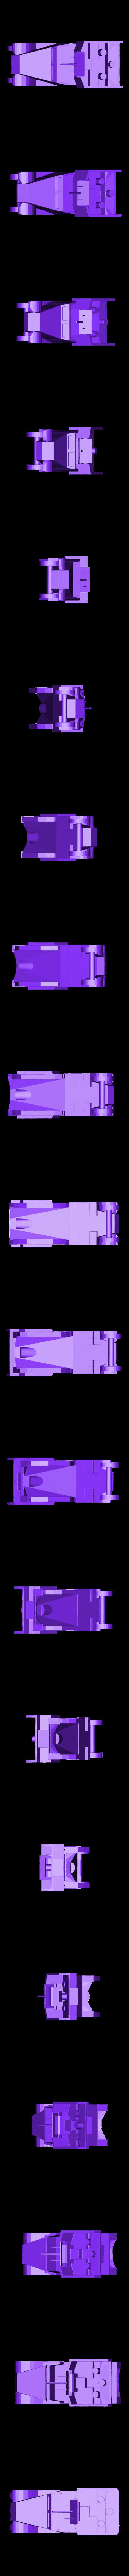 M15_CGMC.stl Download STL file M15A1 CGMC SPAA Half-track • 3D printer model, AntarcticFox